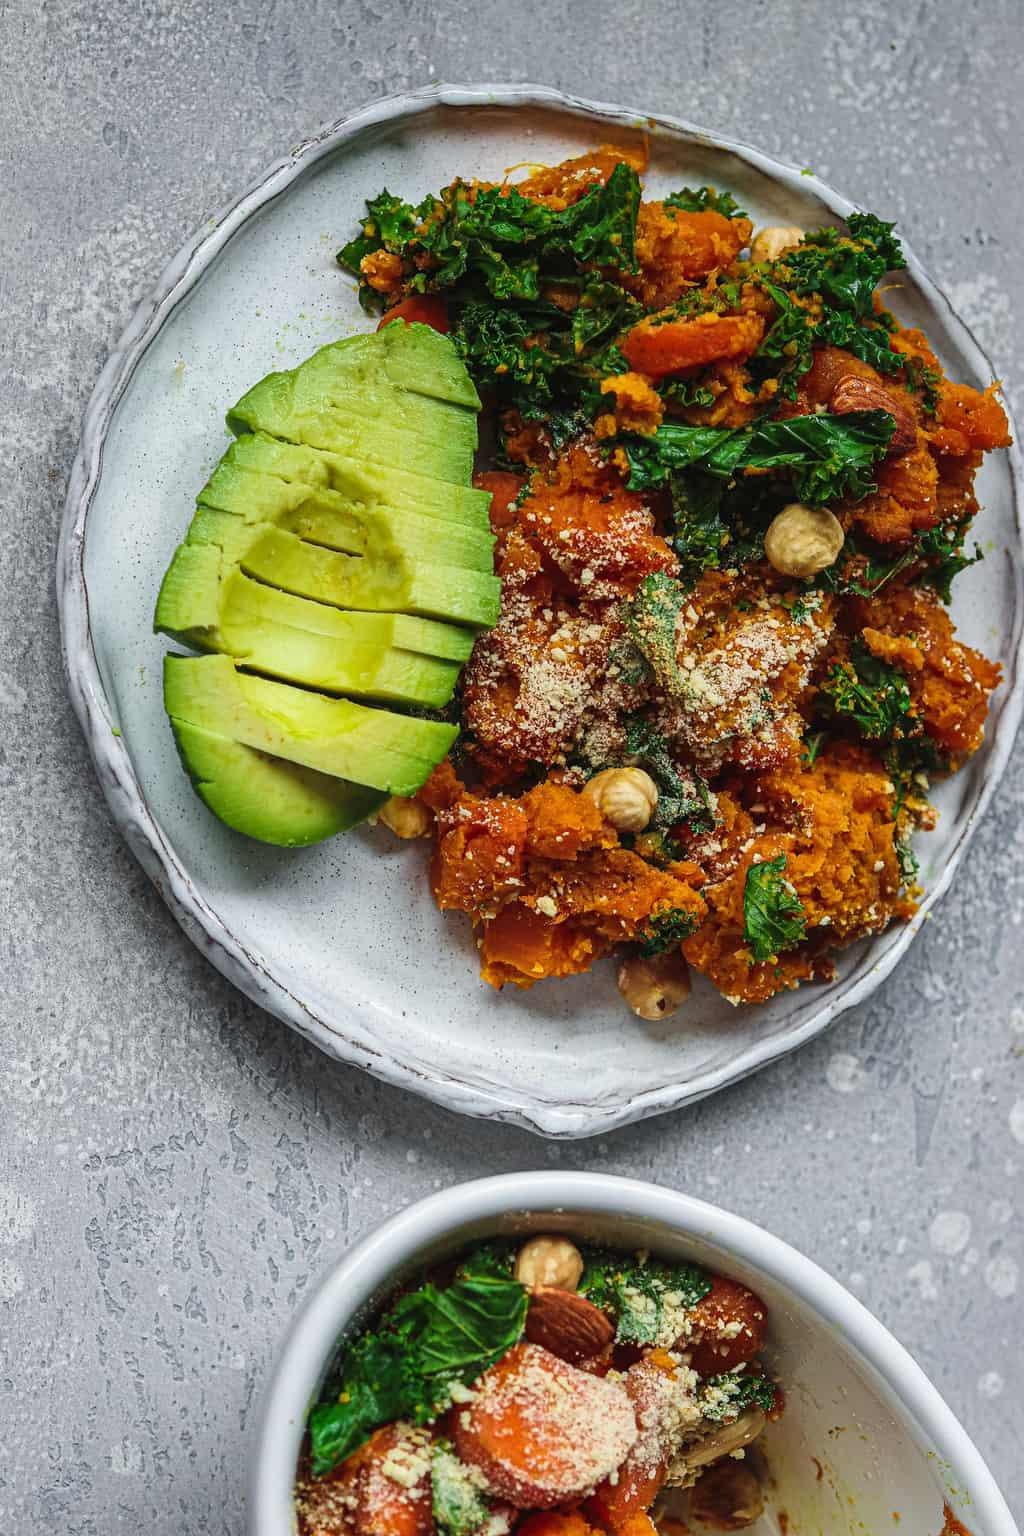 Vegan casserole on a white plate